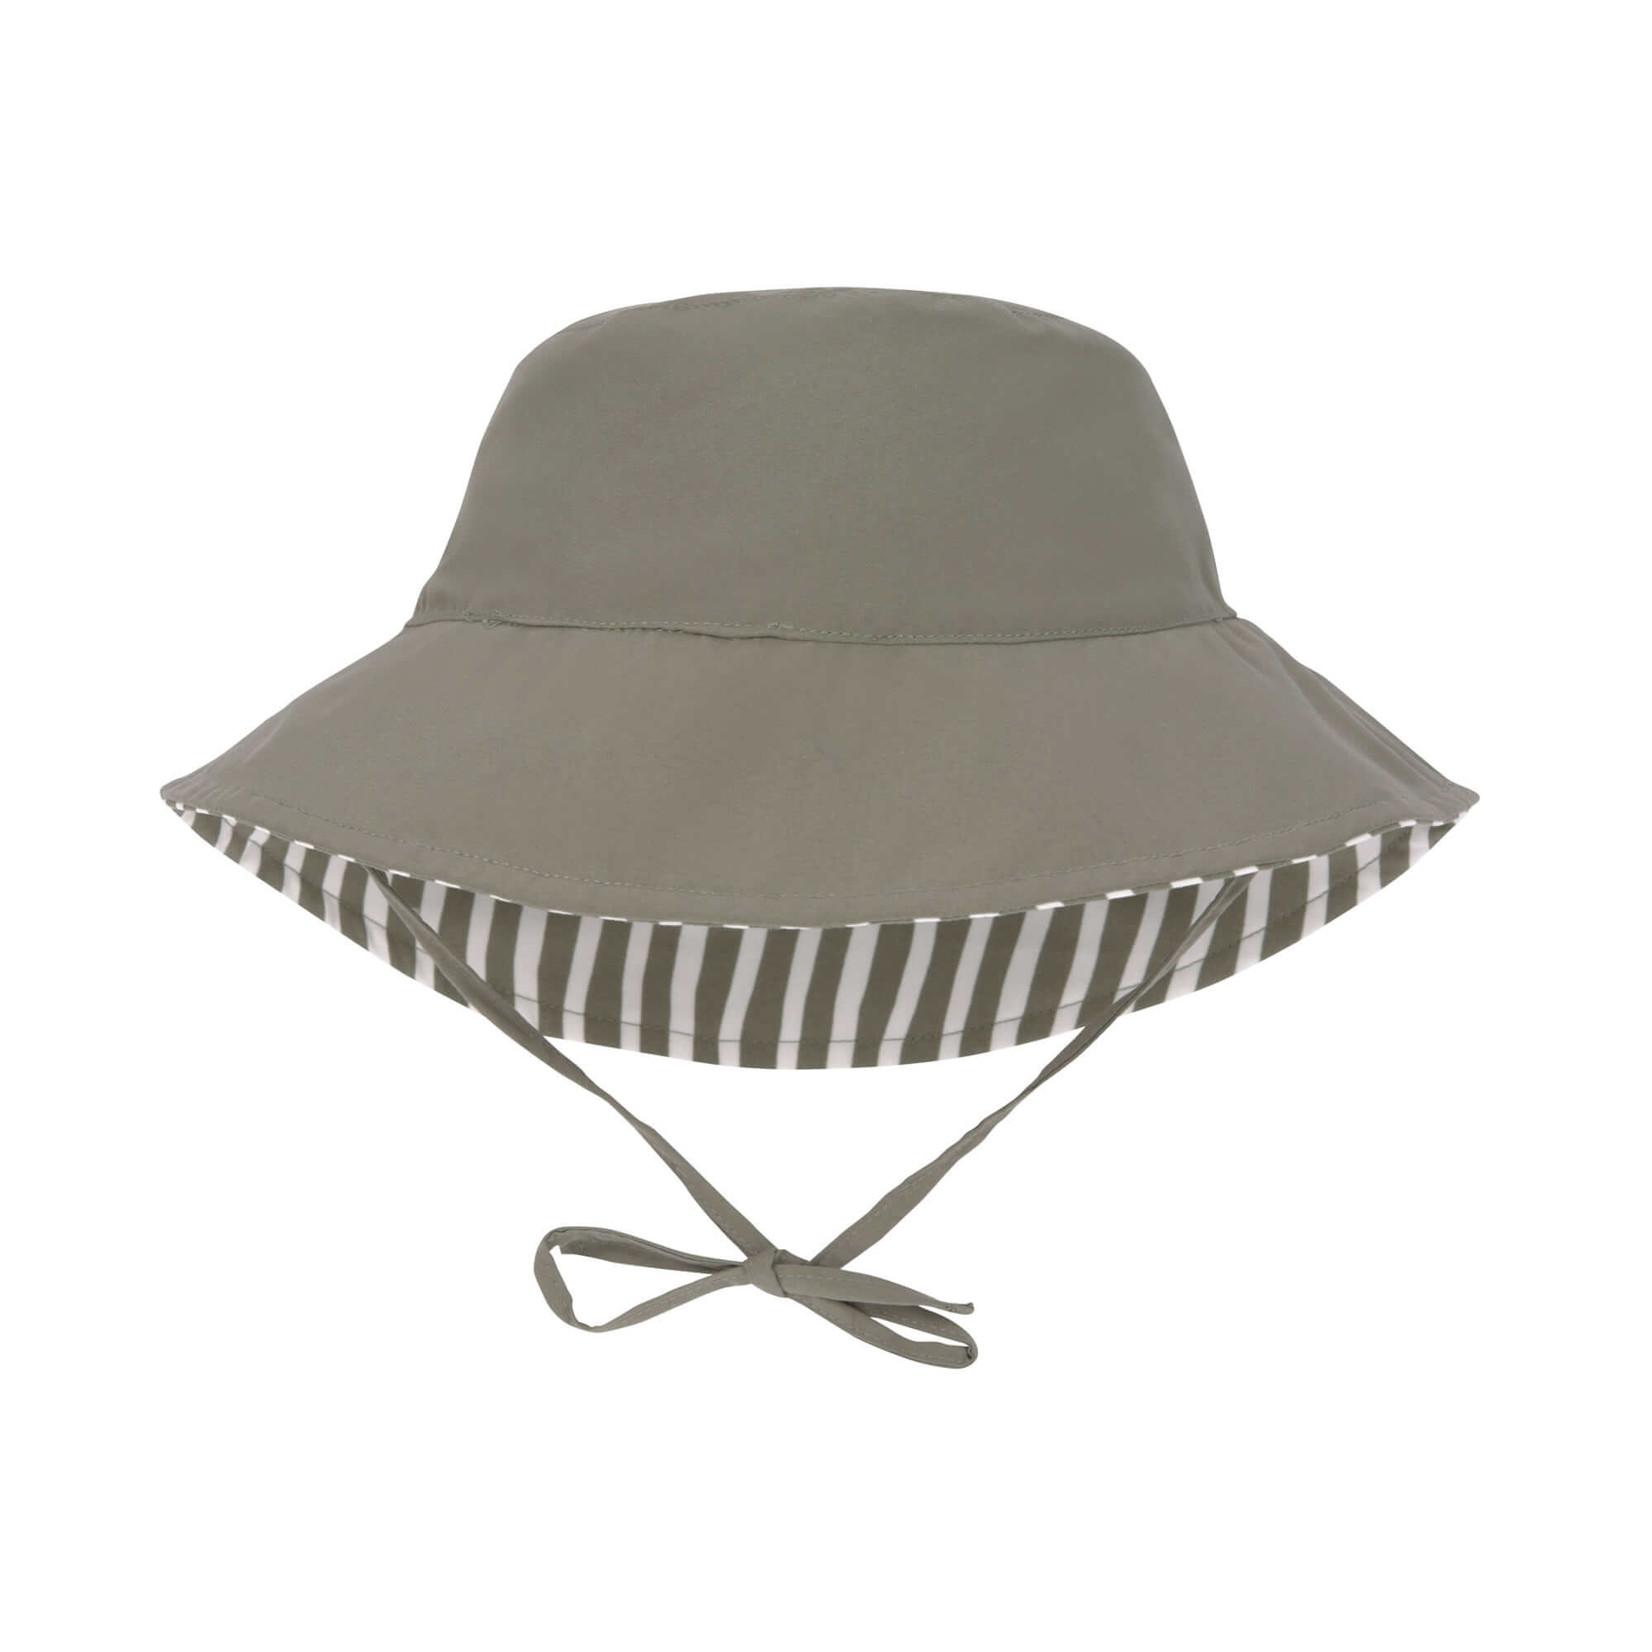 Lässig LSF Sun Protection Bucket Hat  Stripes  Olive